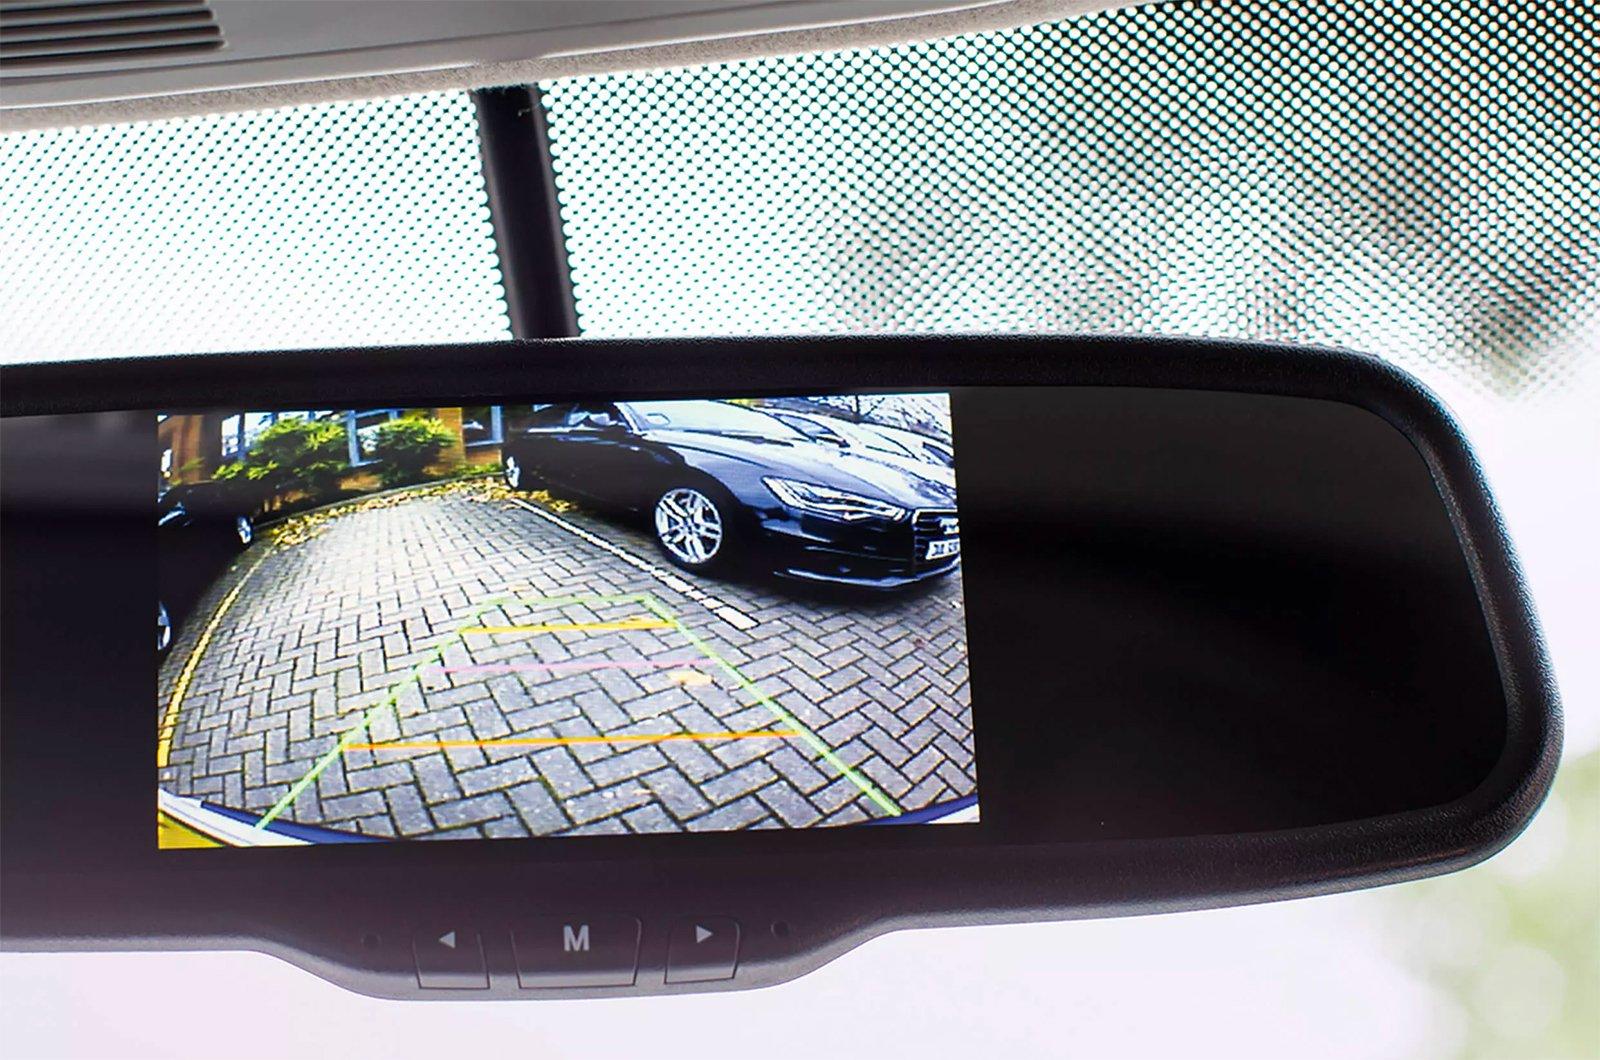 Volkswagen rear-view camera